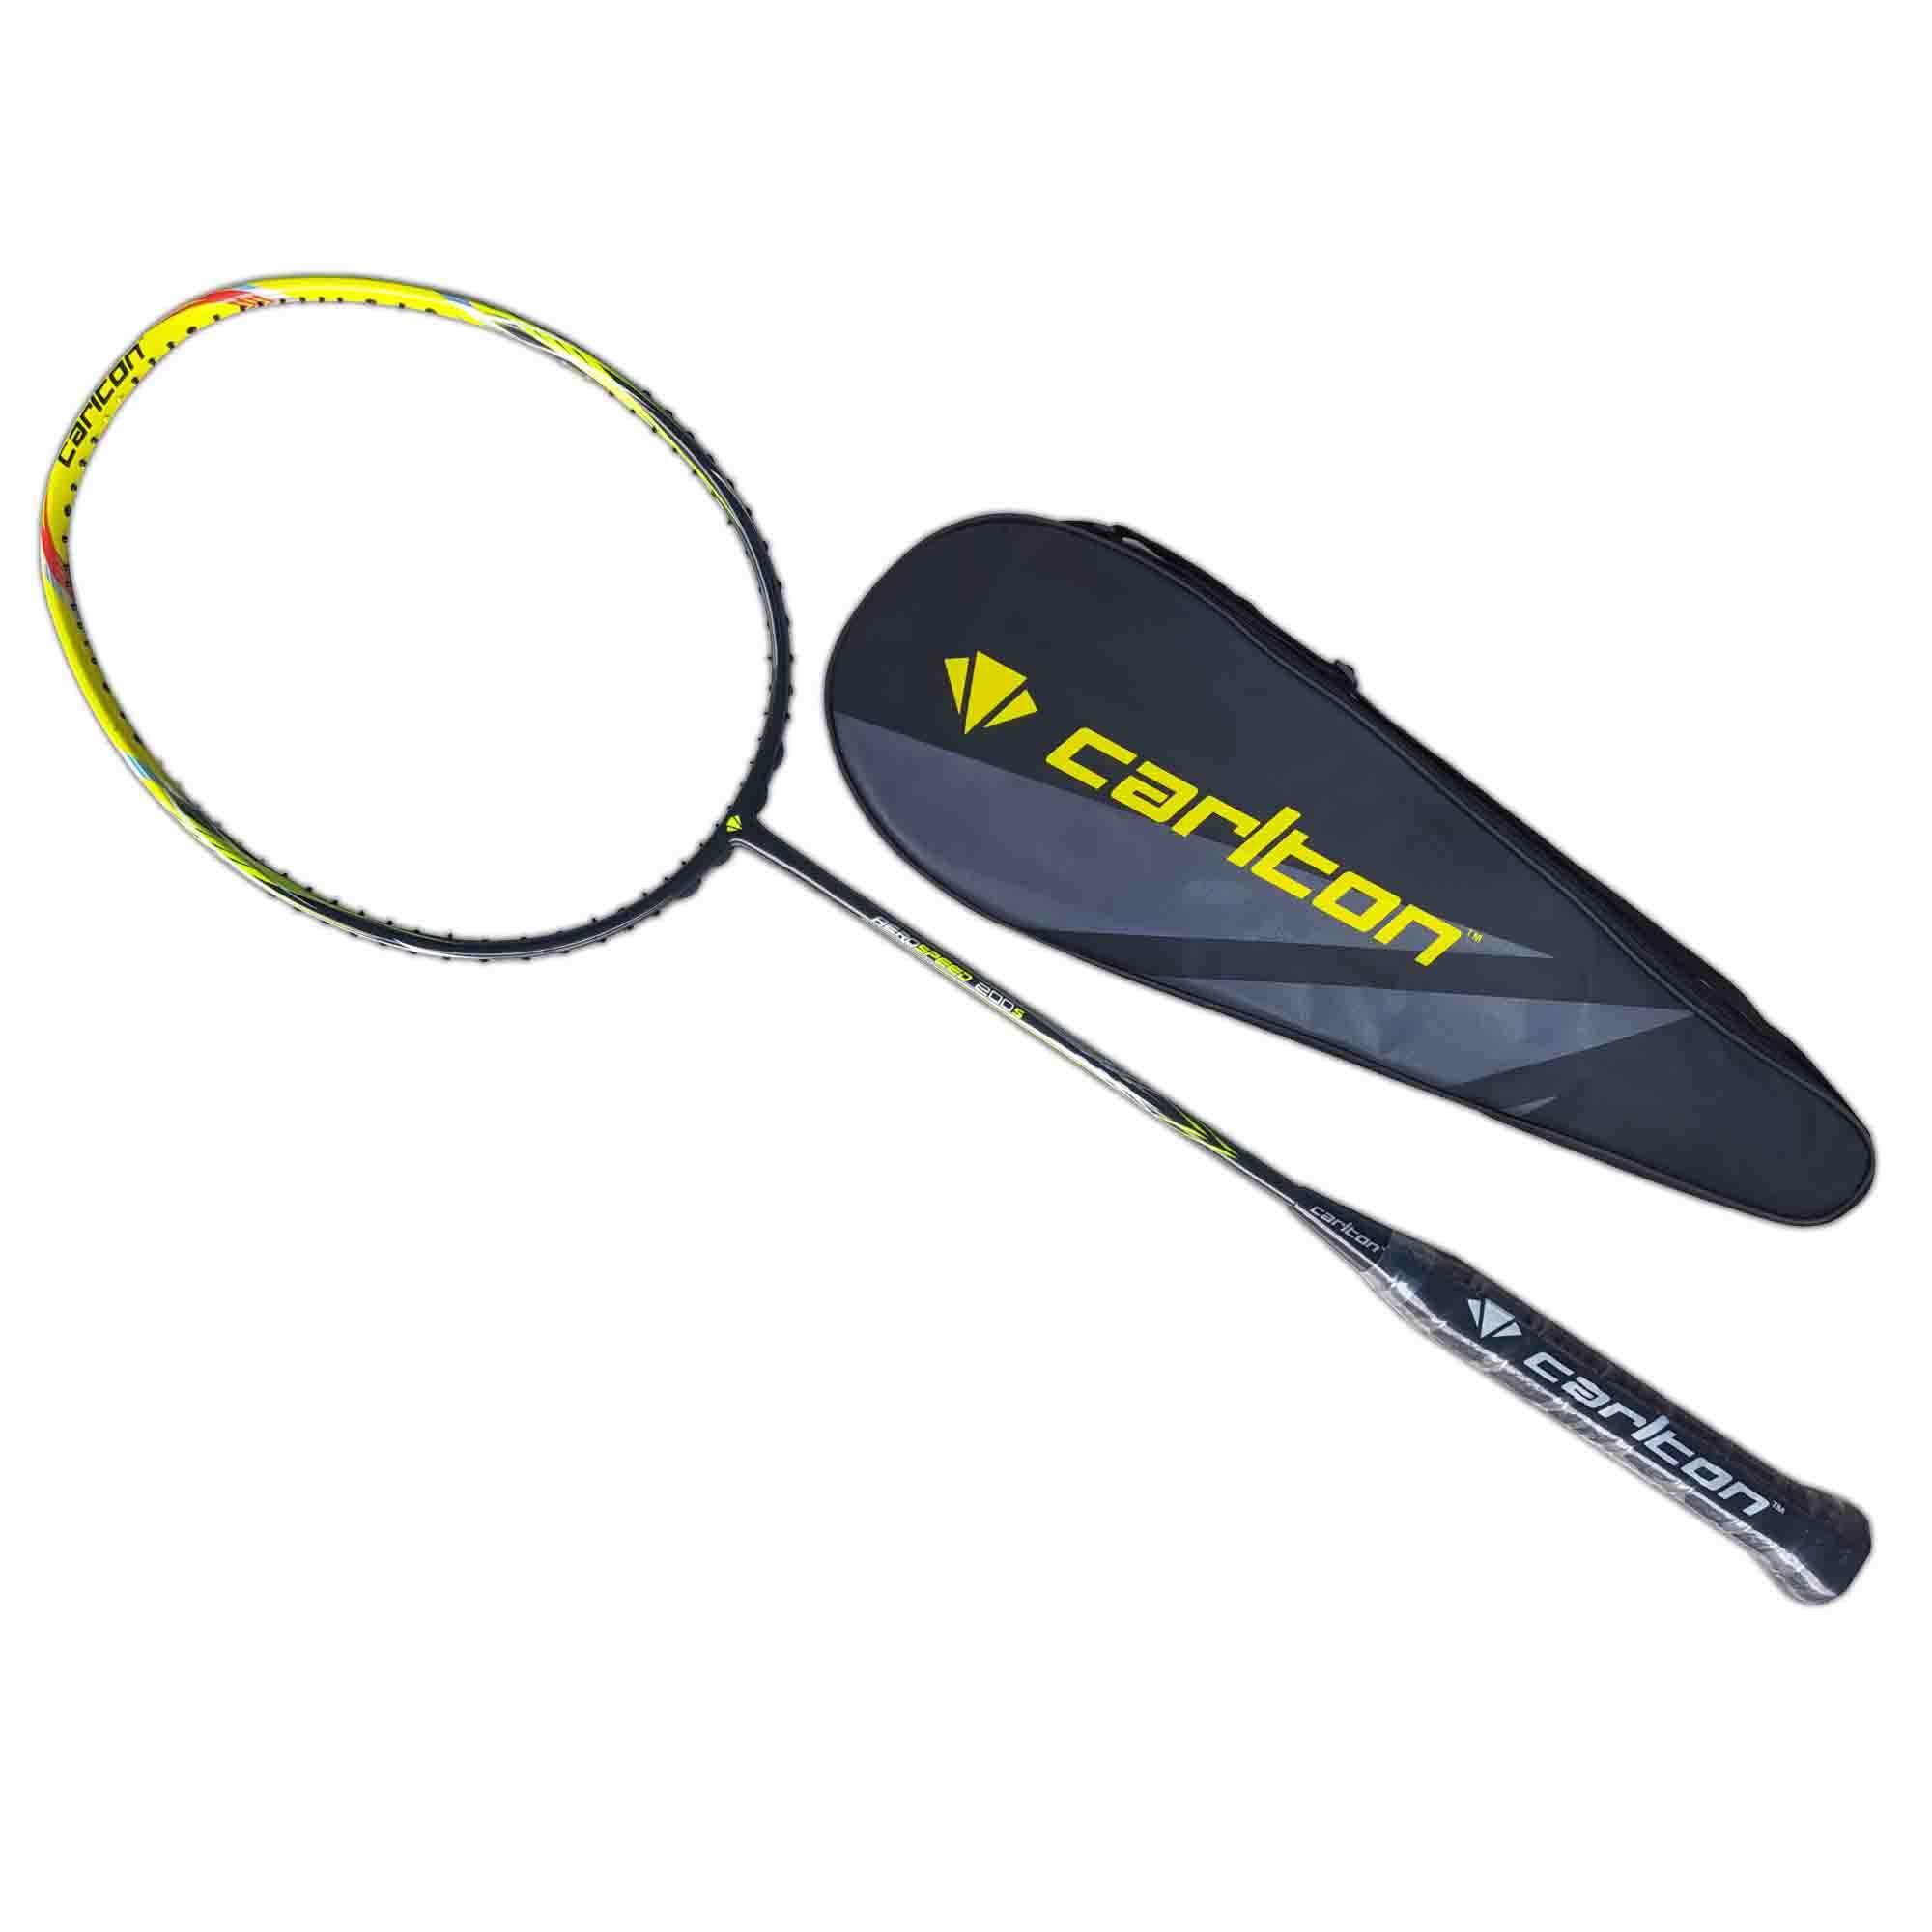 Carlton Badminton Racket Aerospeed 200S